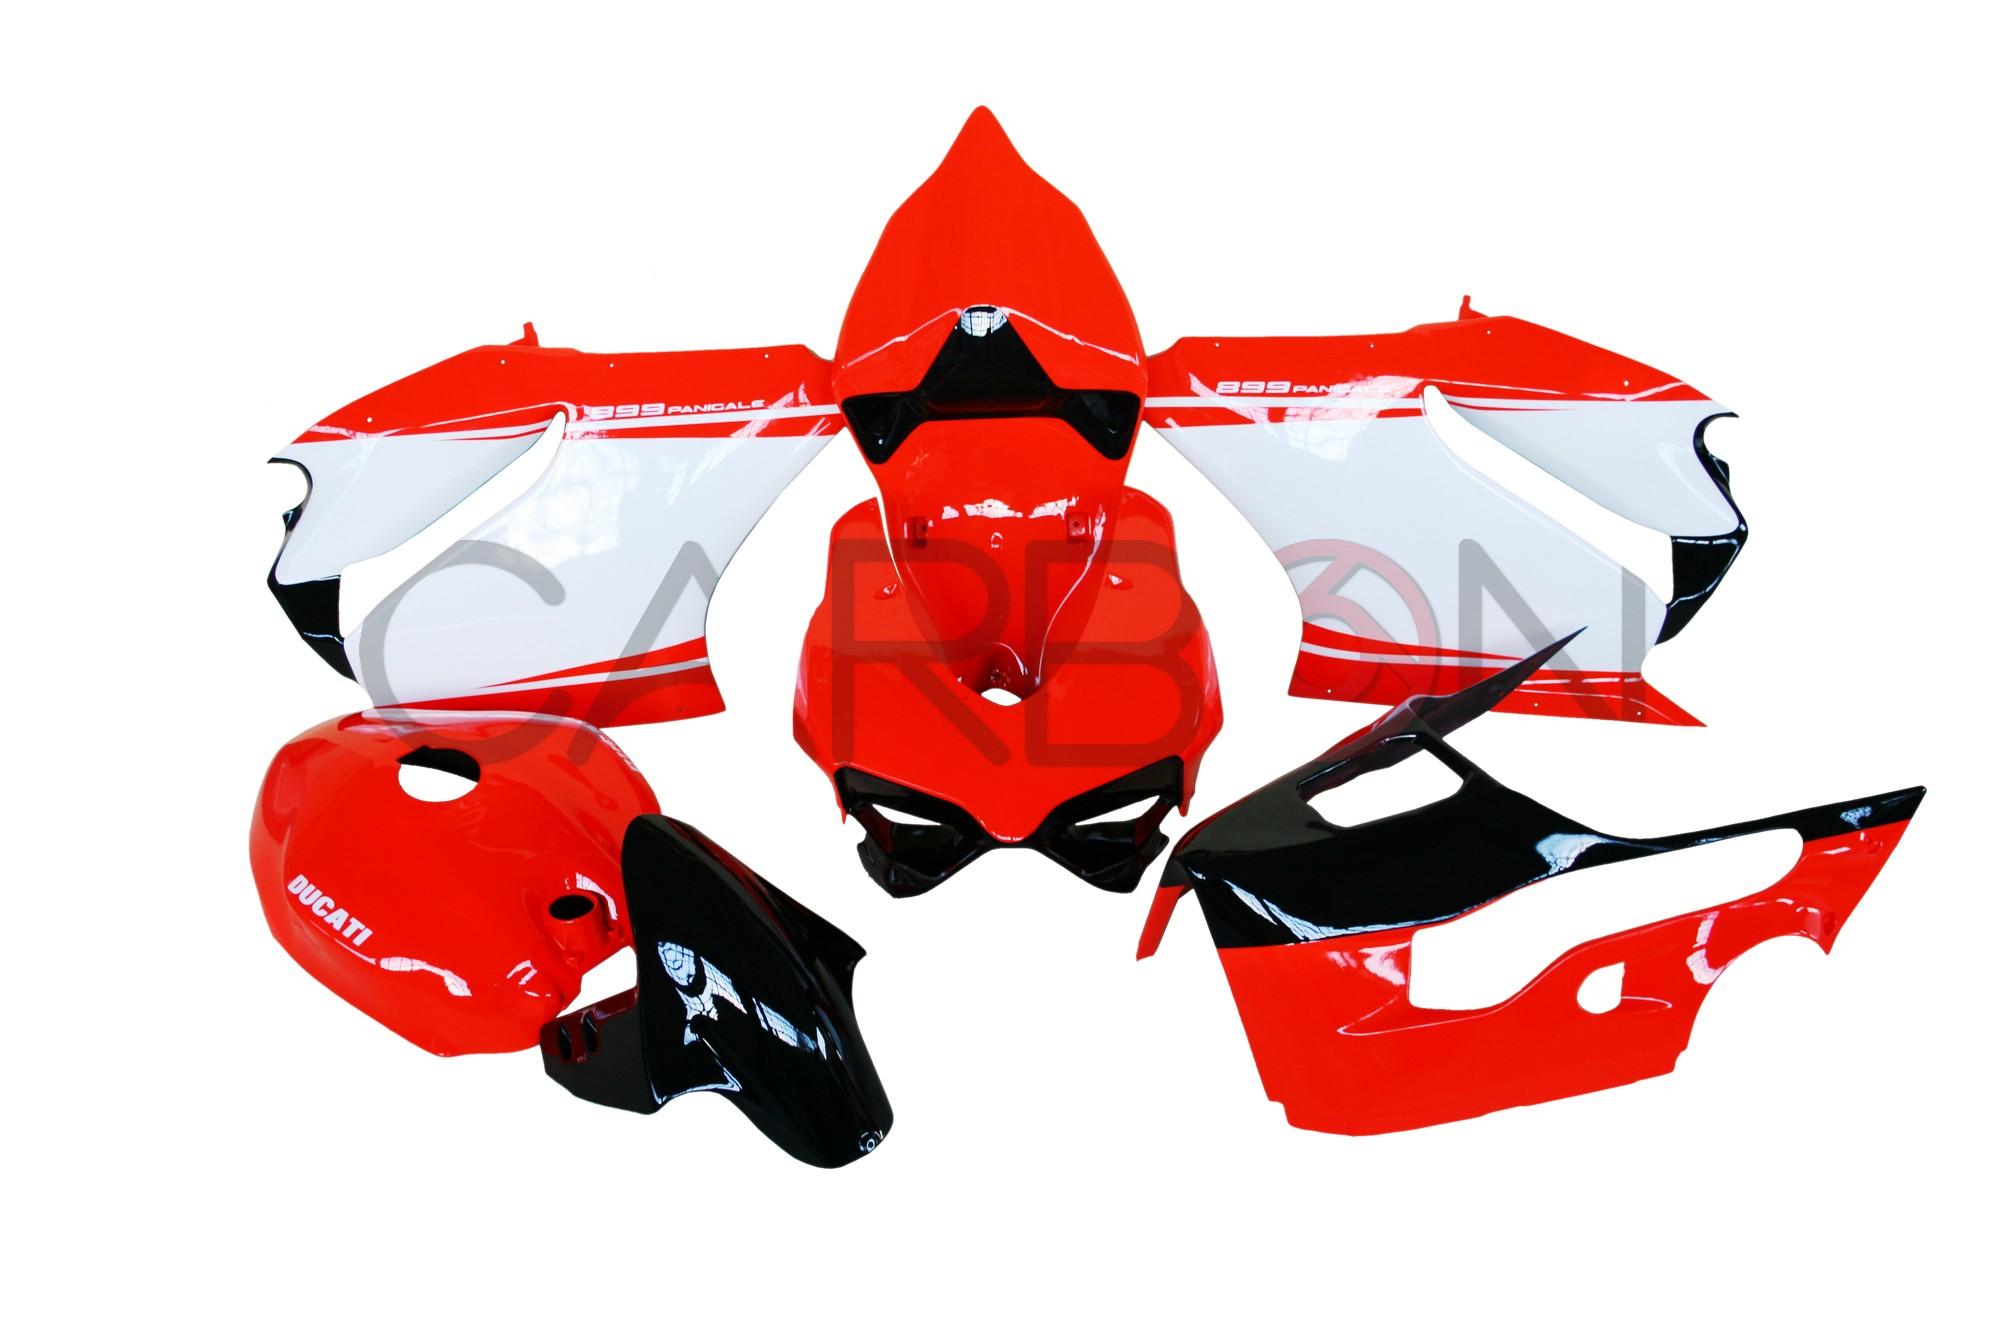 DUCATI 1199 899 PANIGALE RACE DRILLED CLUTCH COVER BOLTS IN SILVER TITANIUM